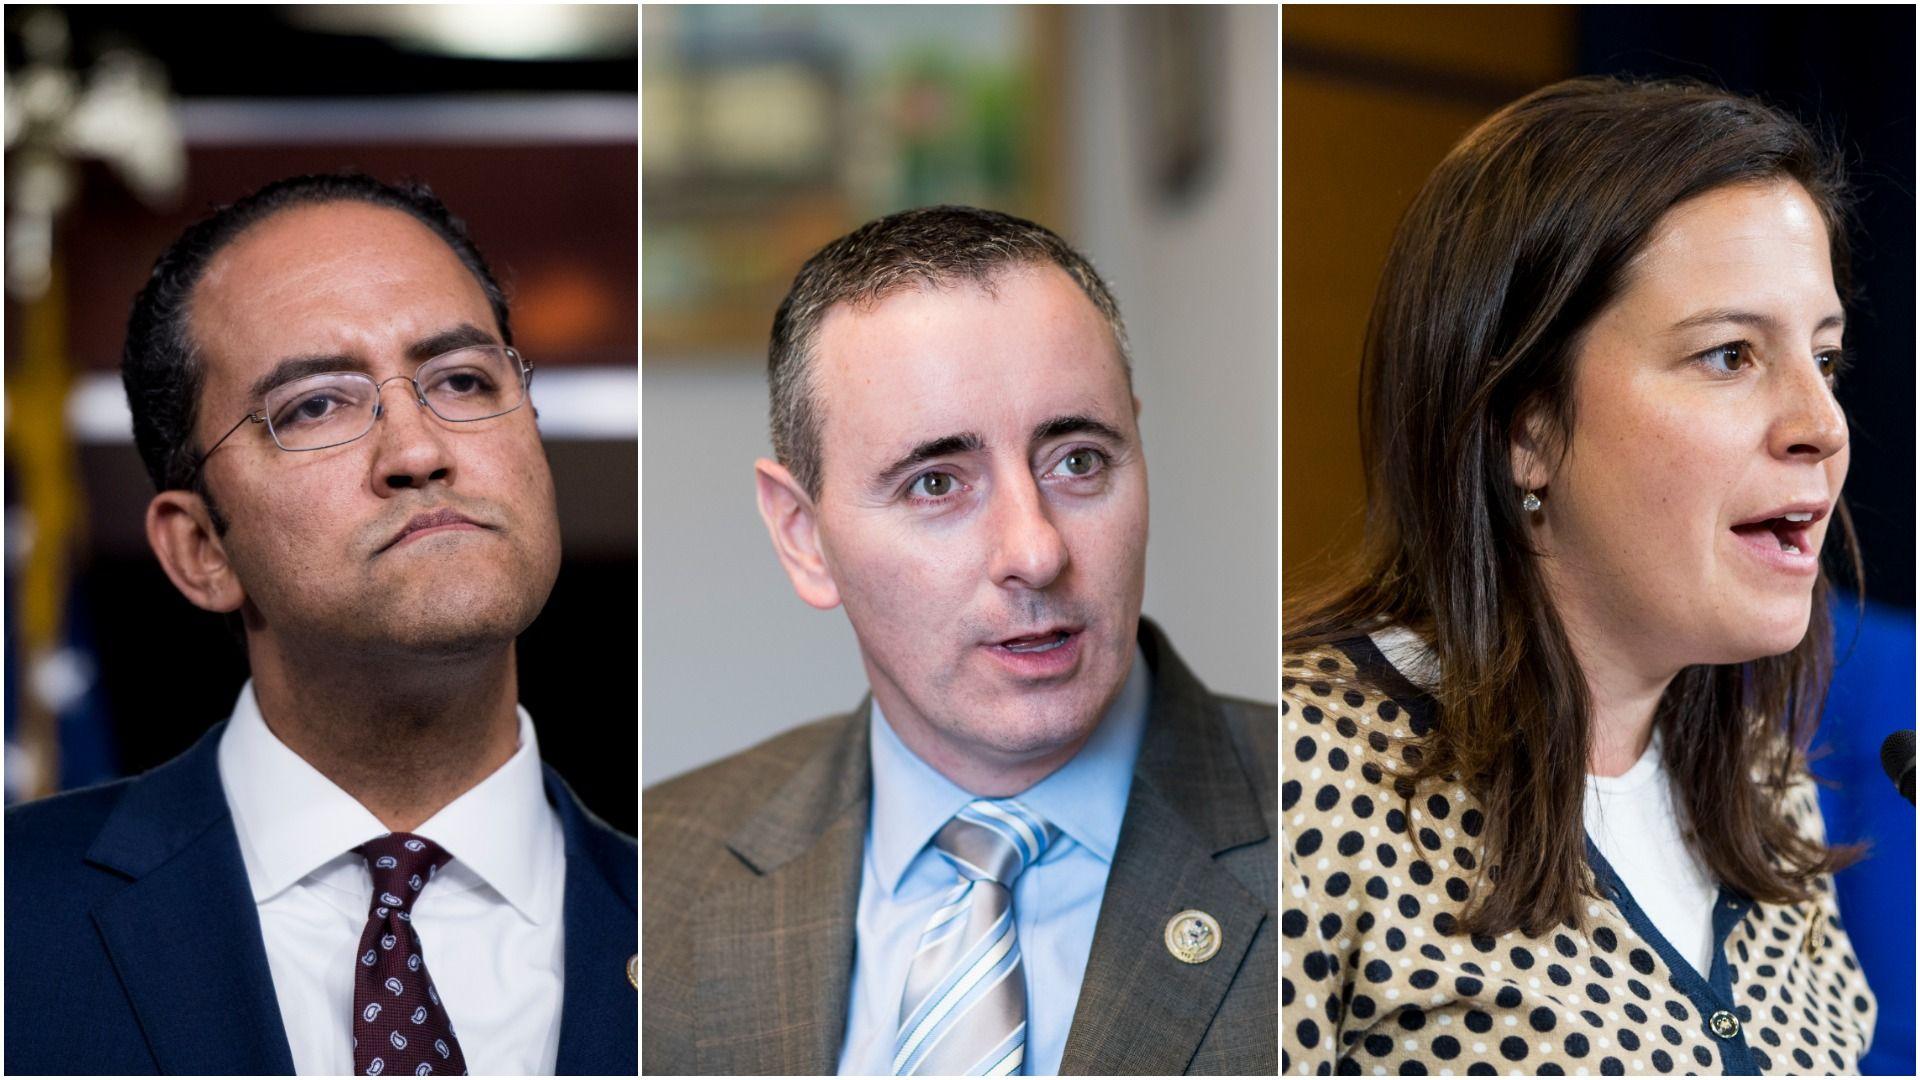 Reps. Will Hurd, (R-Texas), Brian Fitzpatrick, (R-Pa.) and Elise Stefanik, (R-N.Y.)